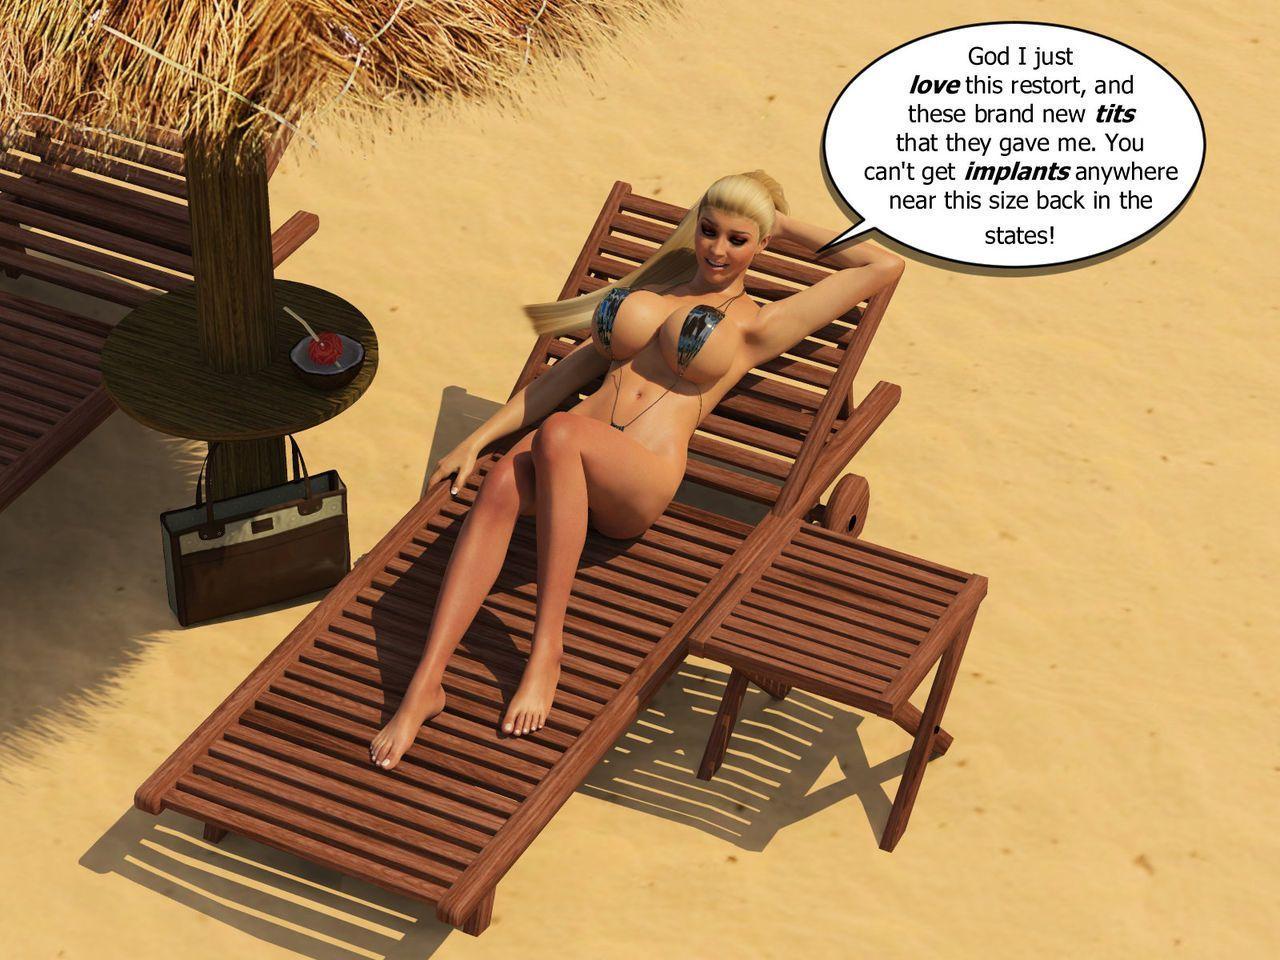 [phoenyxx] Beach Bikini Blow Up Doll